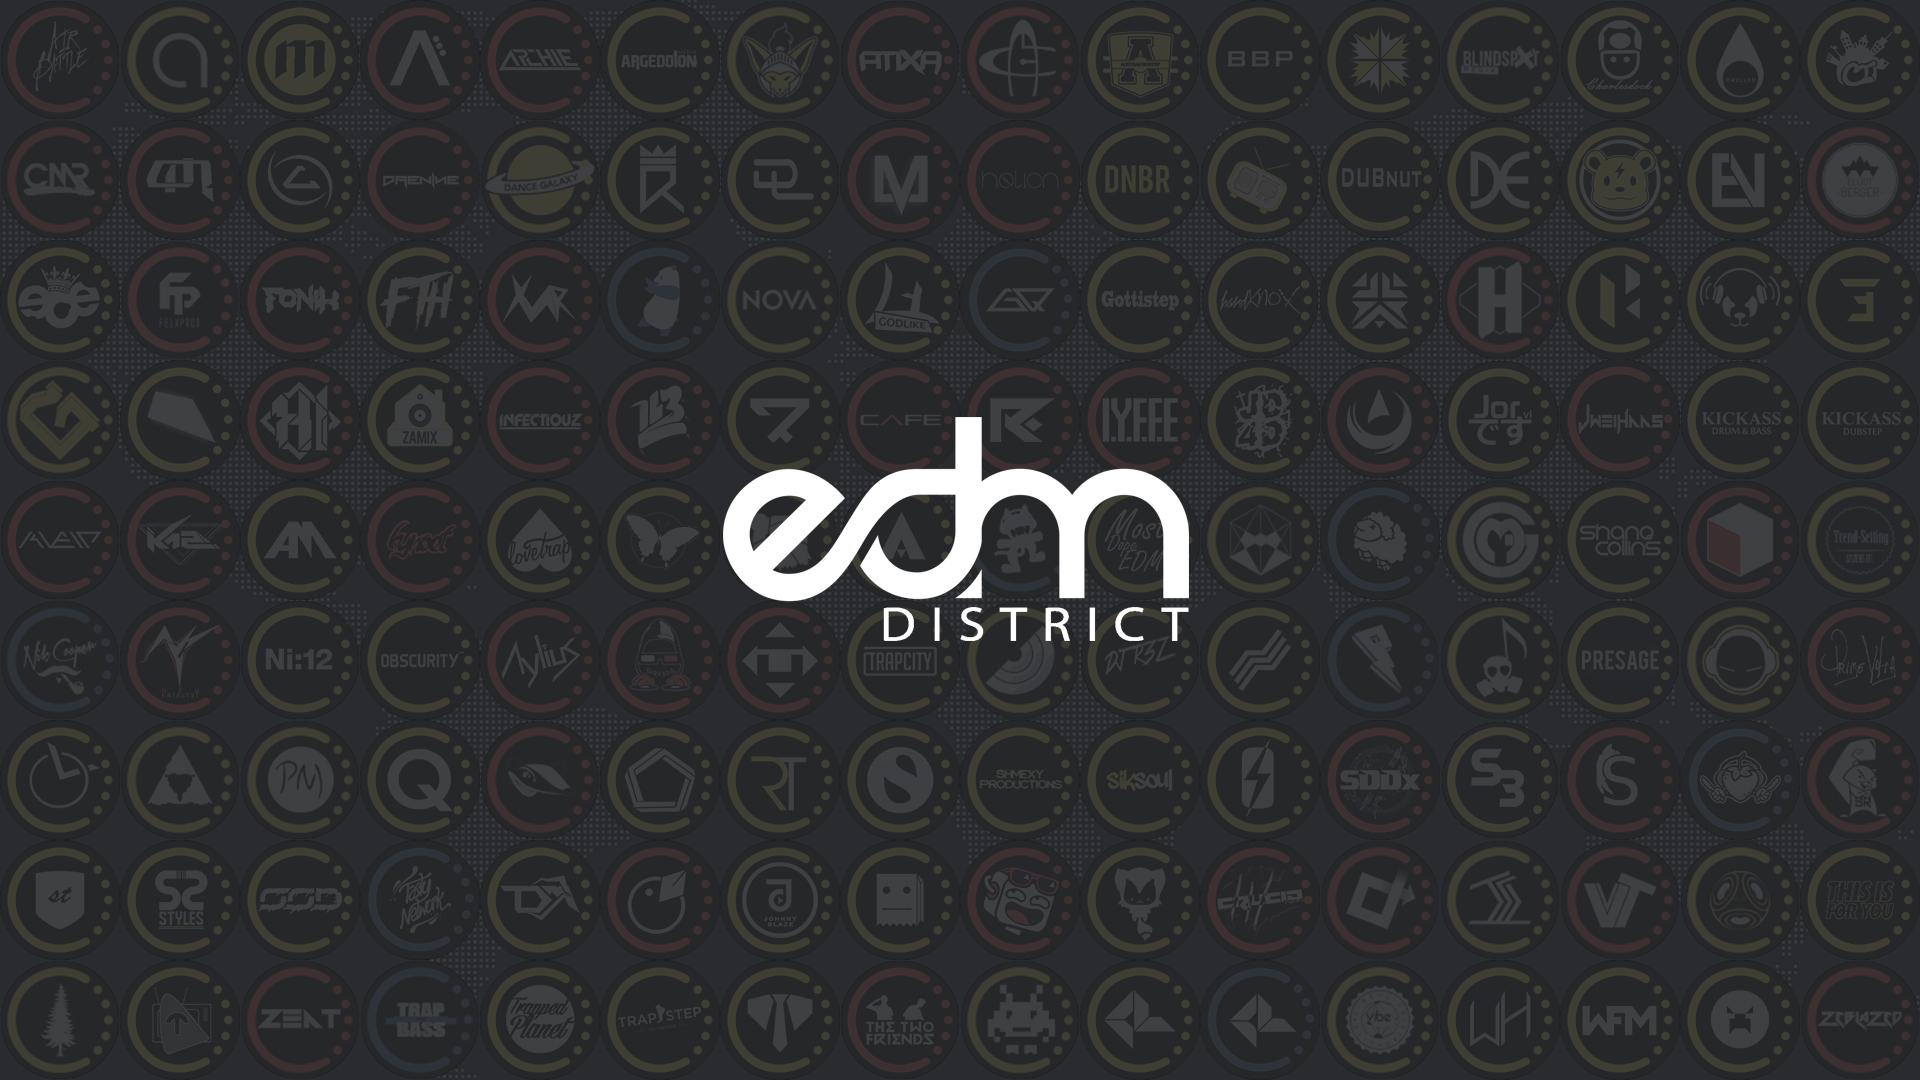 Edm District Hd Wallpaper for Dekstop Image Label